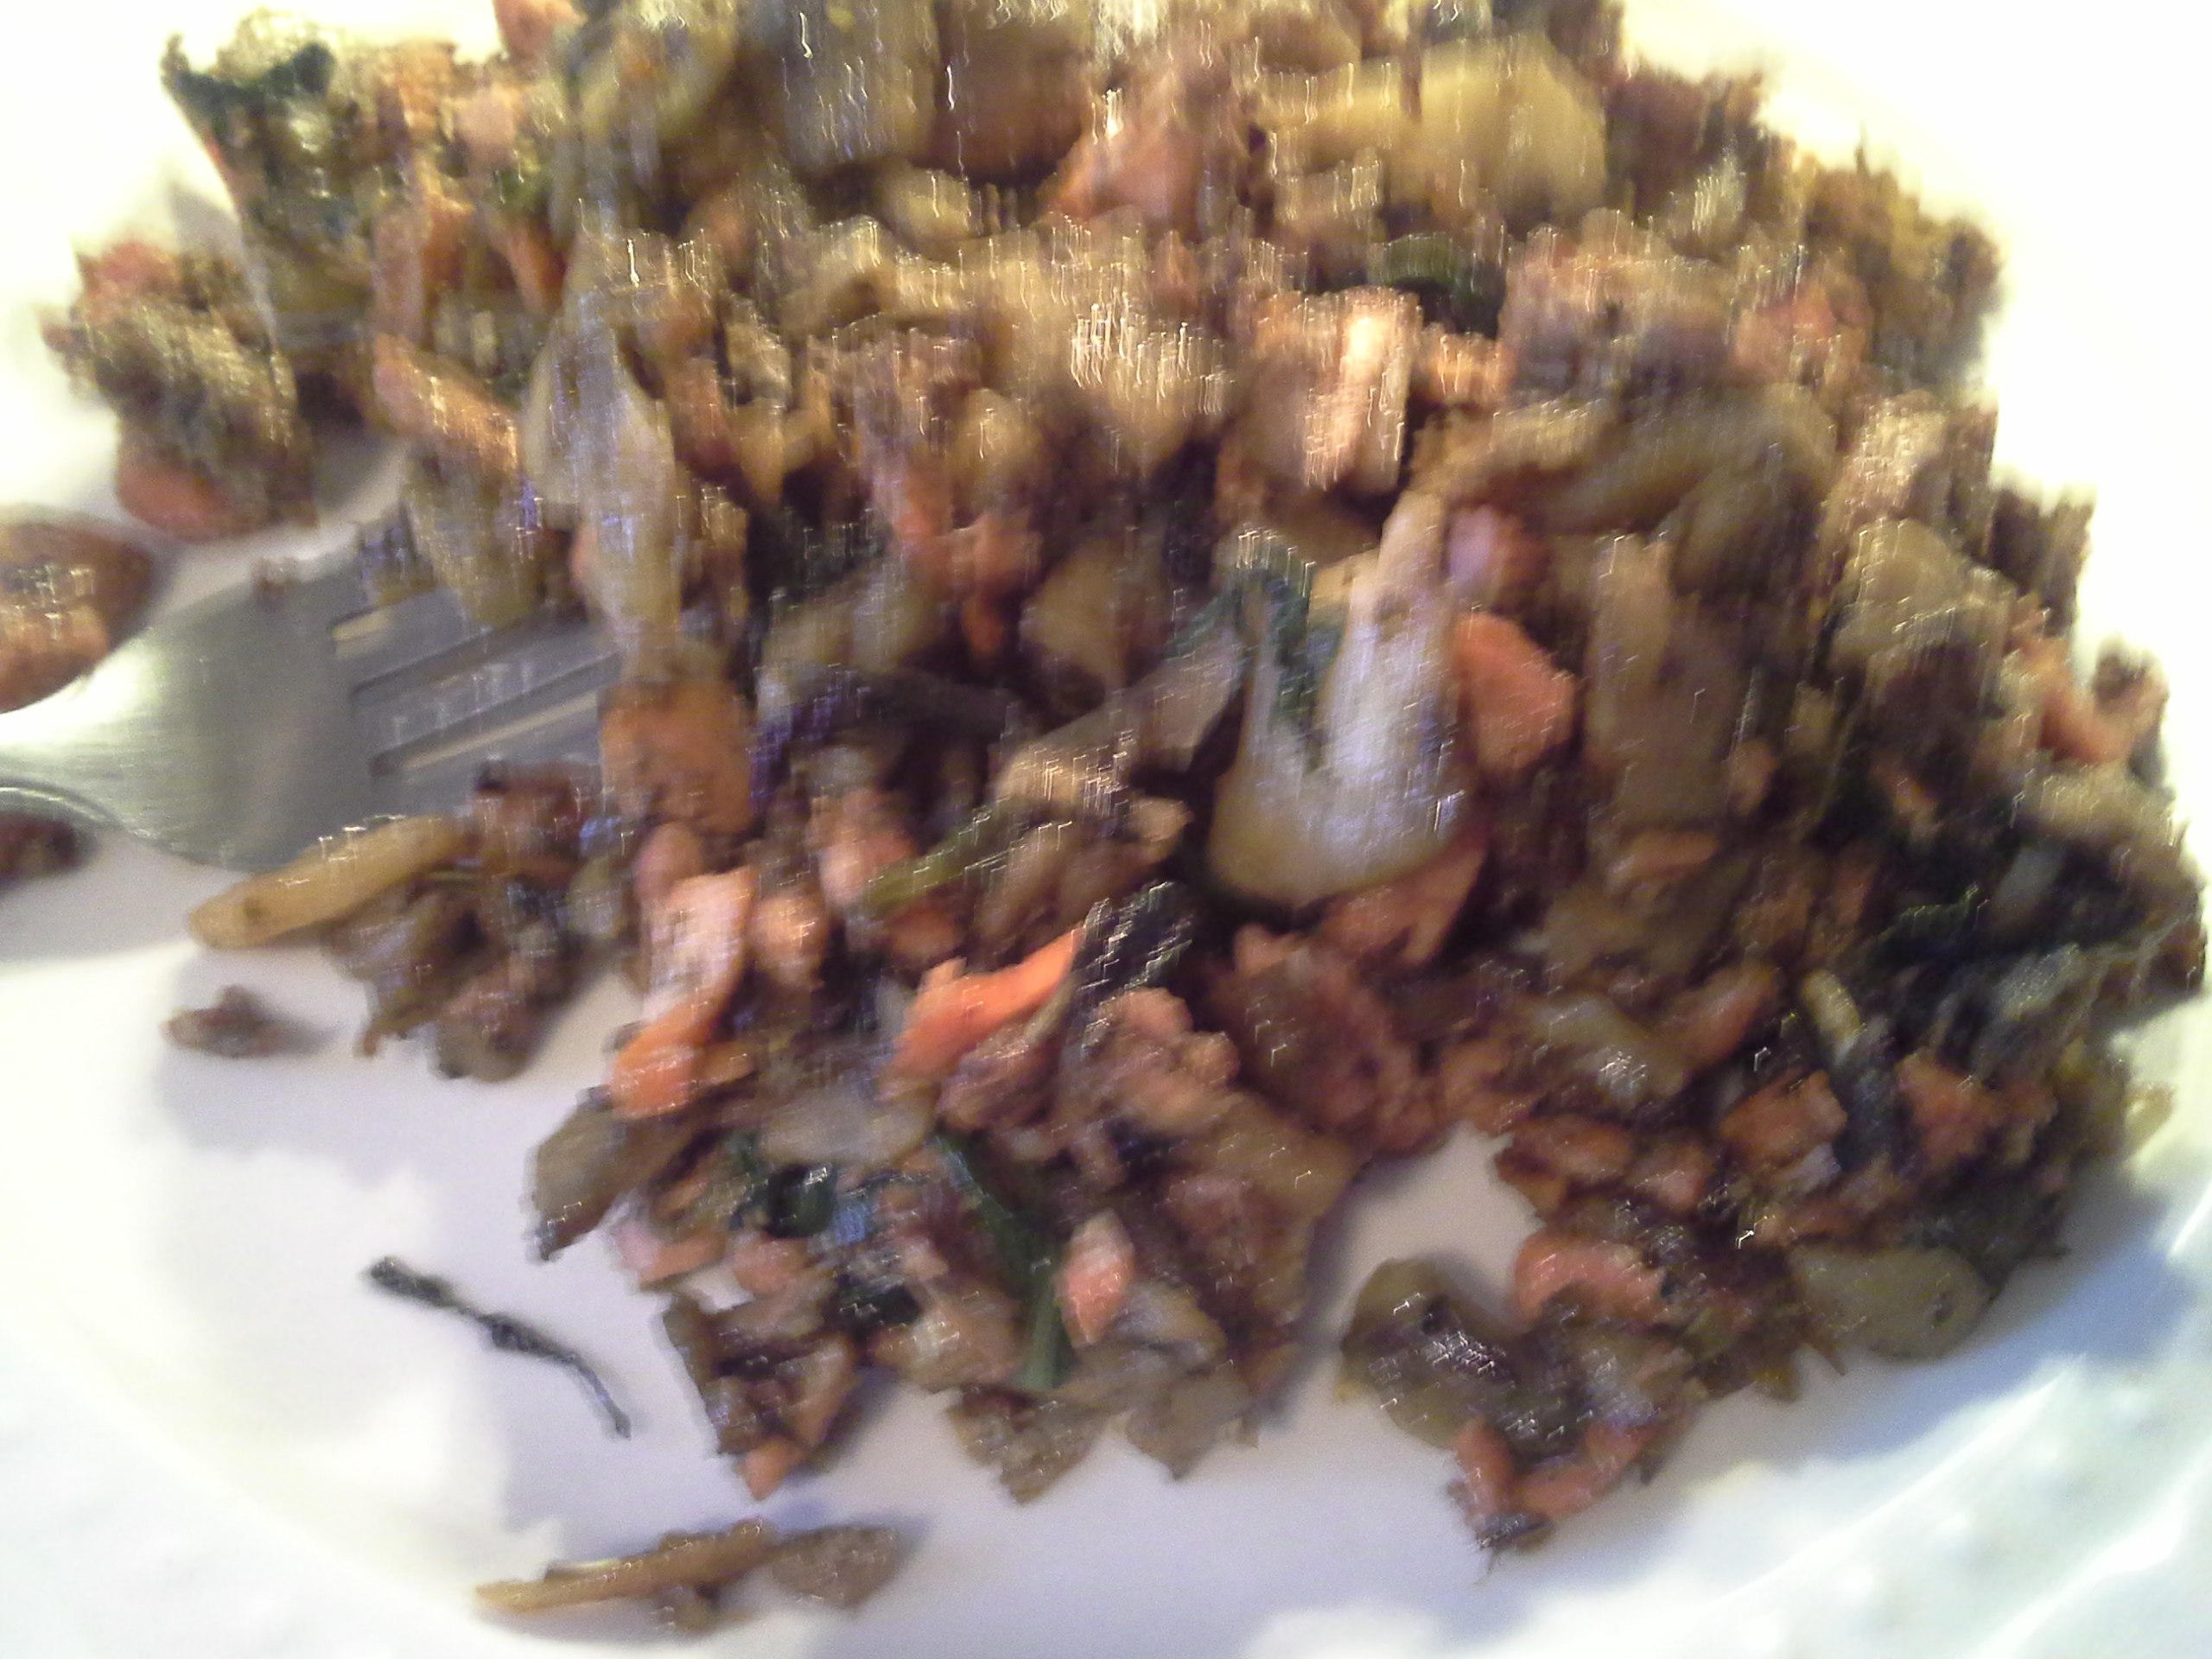 Breakfast: 11:35 a.m.   8 oz. salmon, 1/2 celeriac root, greens mix, 2 Tbsp. coconut oil, herbs & spices